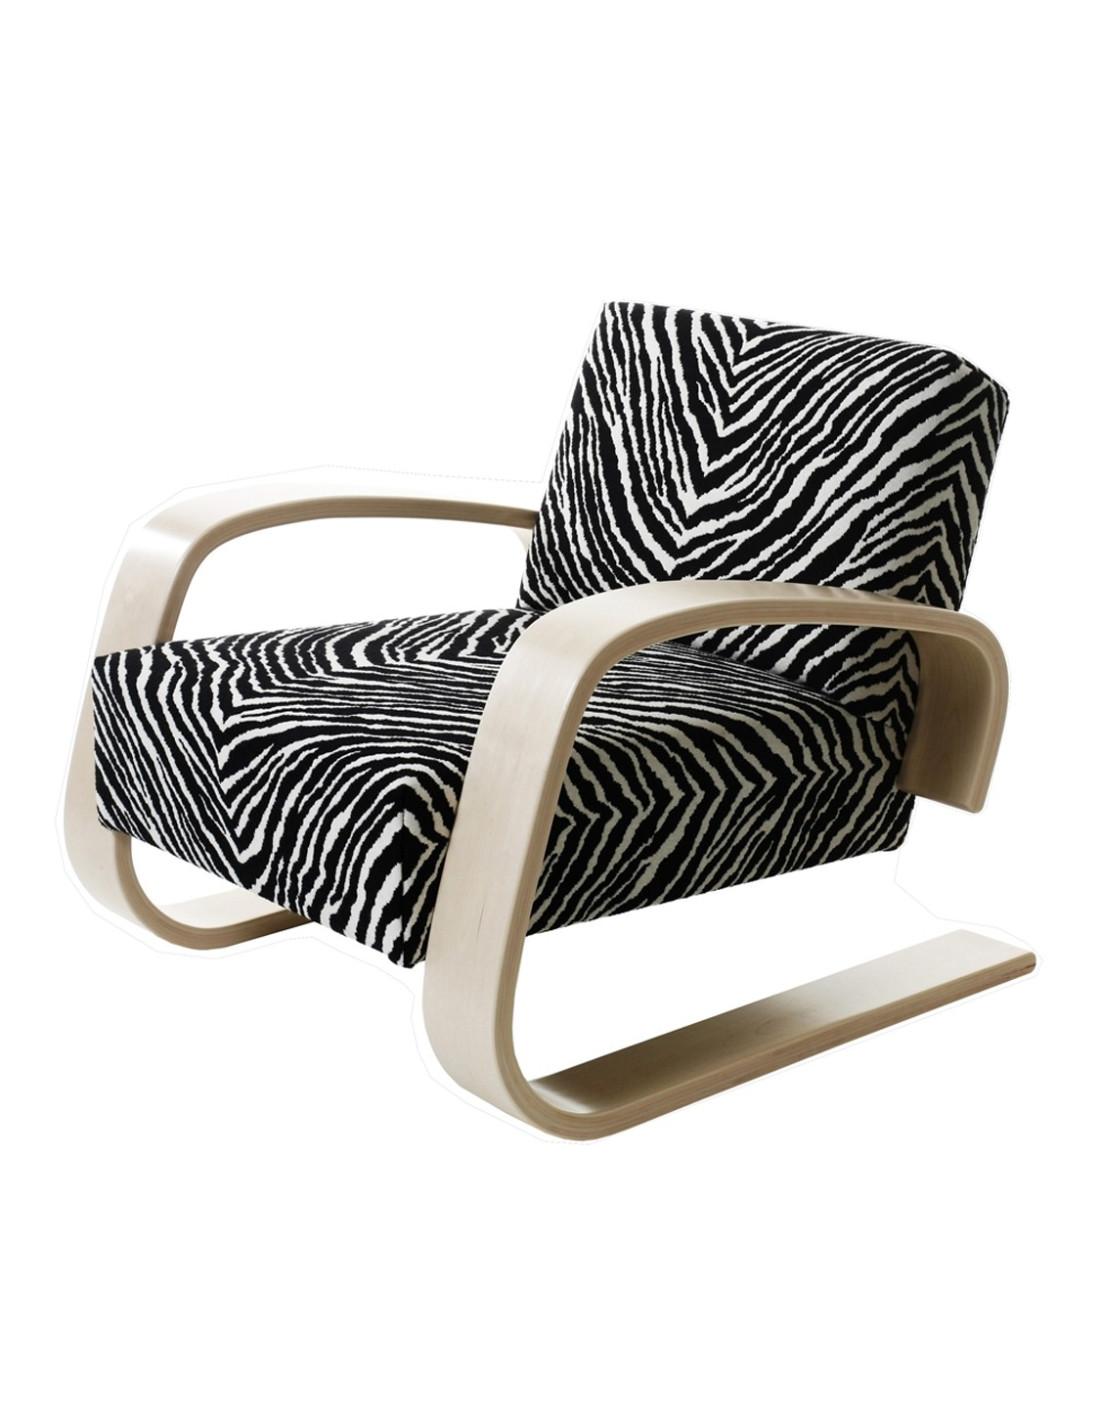 fauteuil 400 tank de alvar aalto pour artek fauteuil design danois. Black Bedroom Furniture Sets. Home Design Ideas